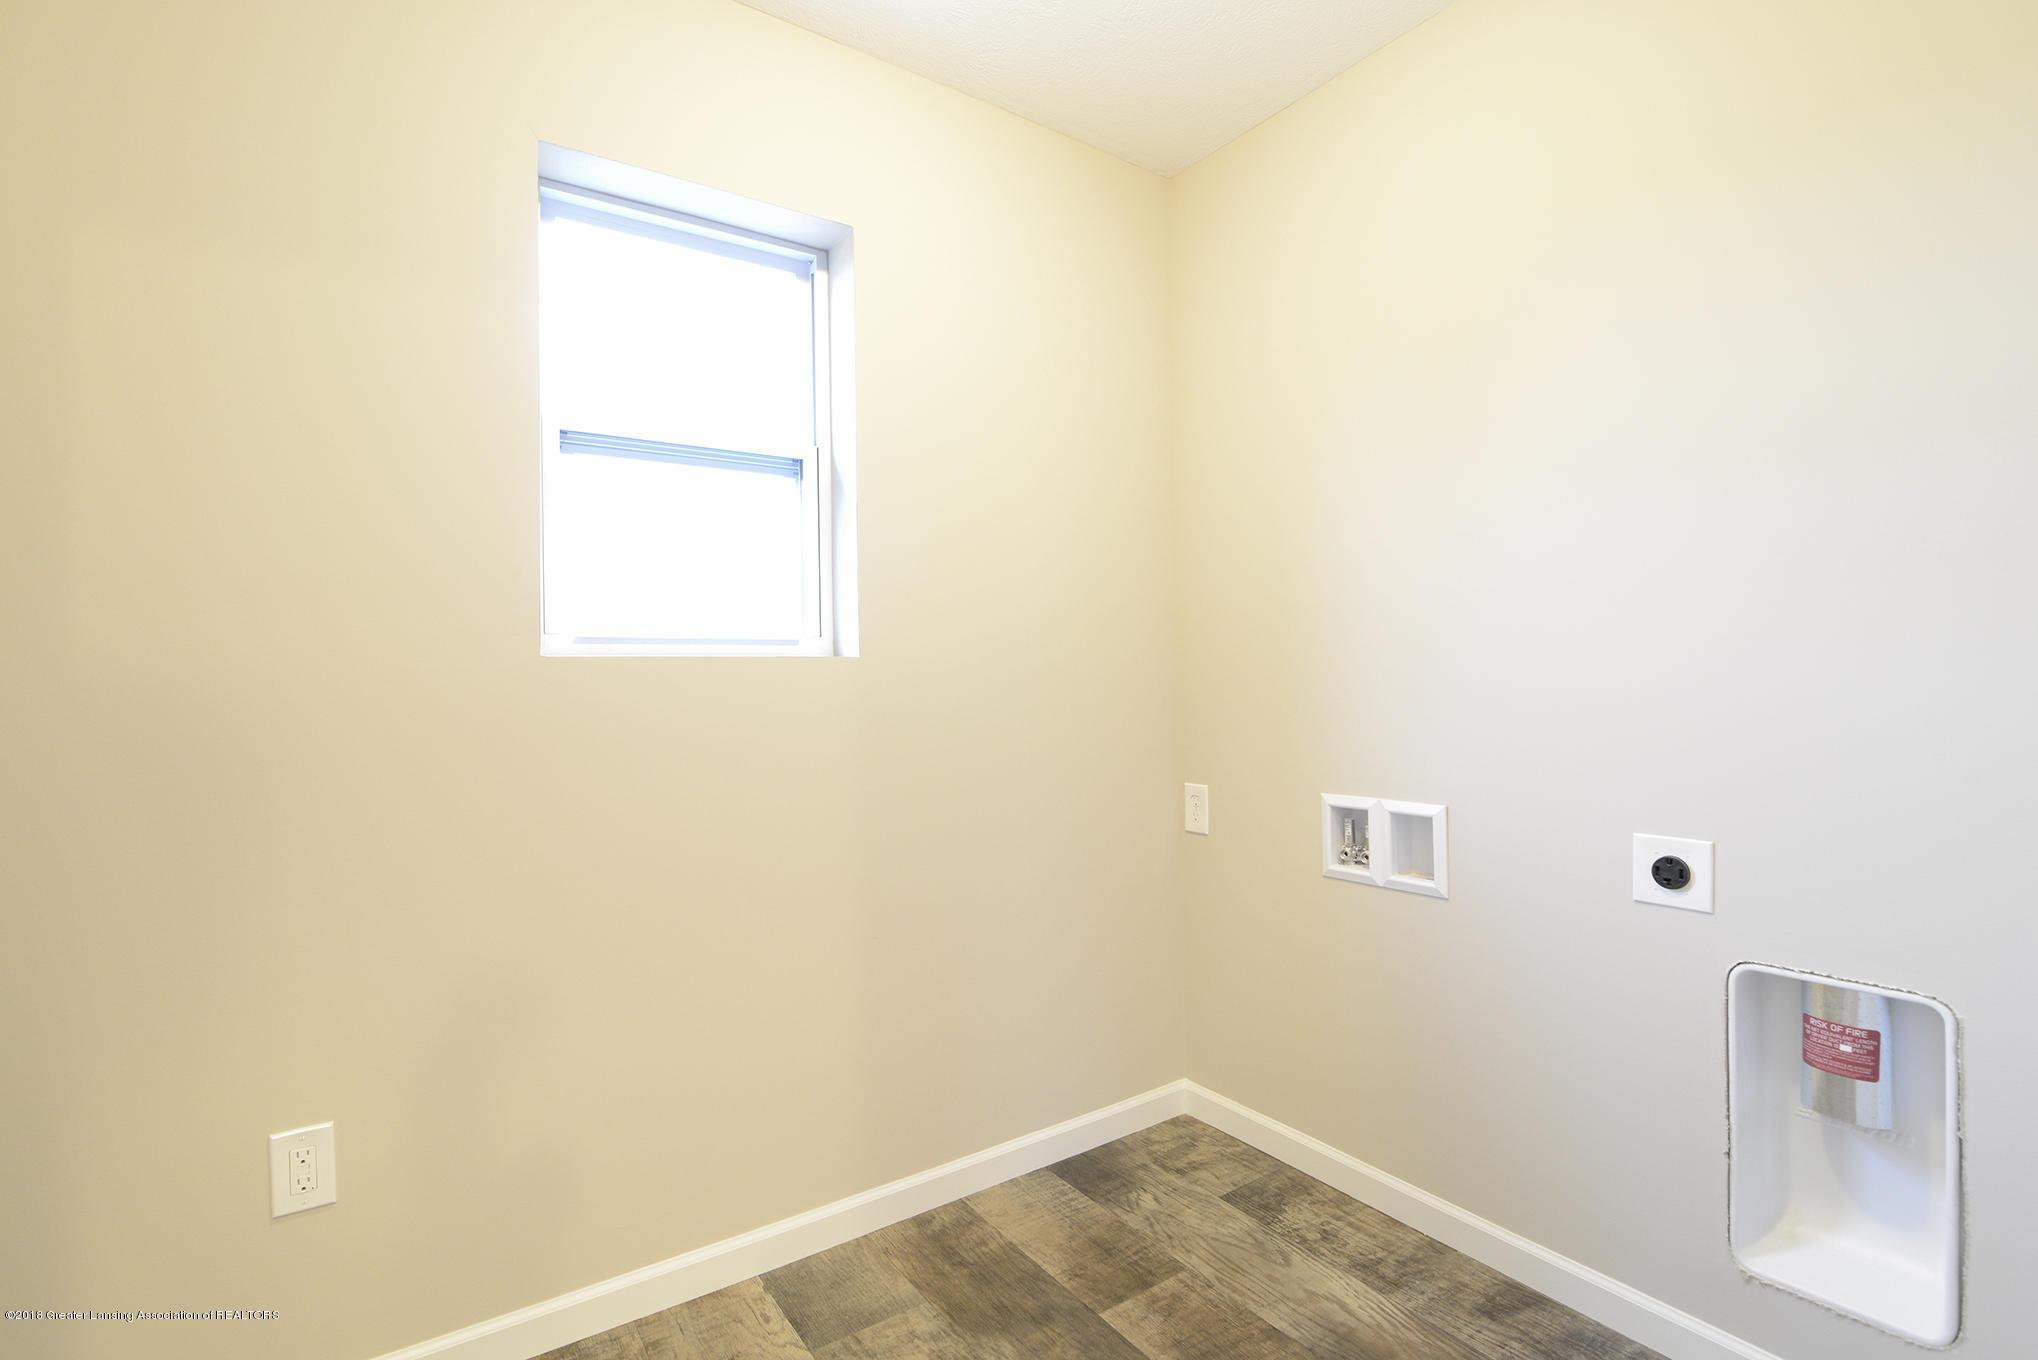 3586 Fernwood Ln - GDN111-E1700 Laundry Room - 12